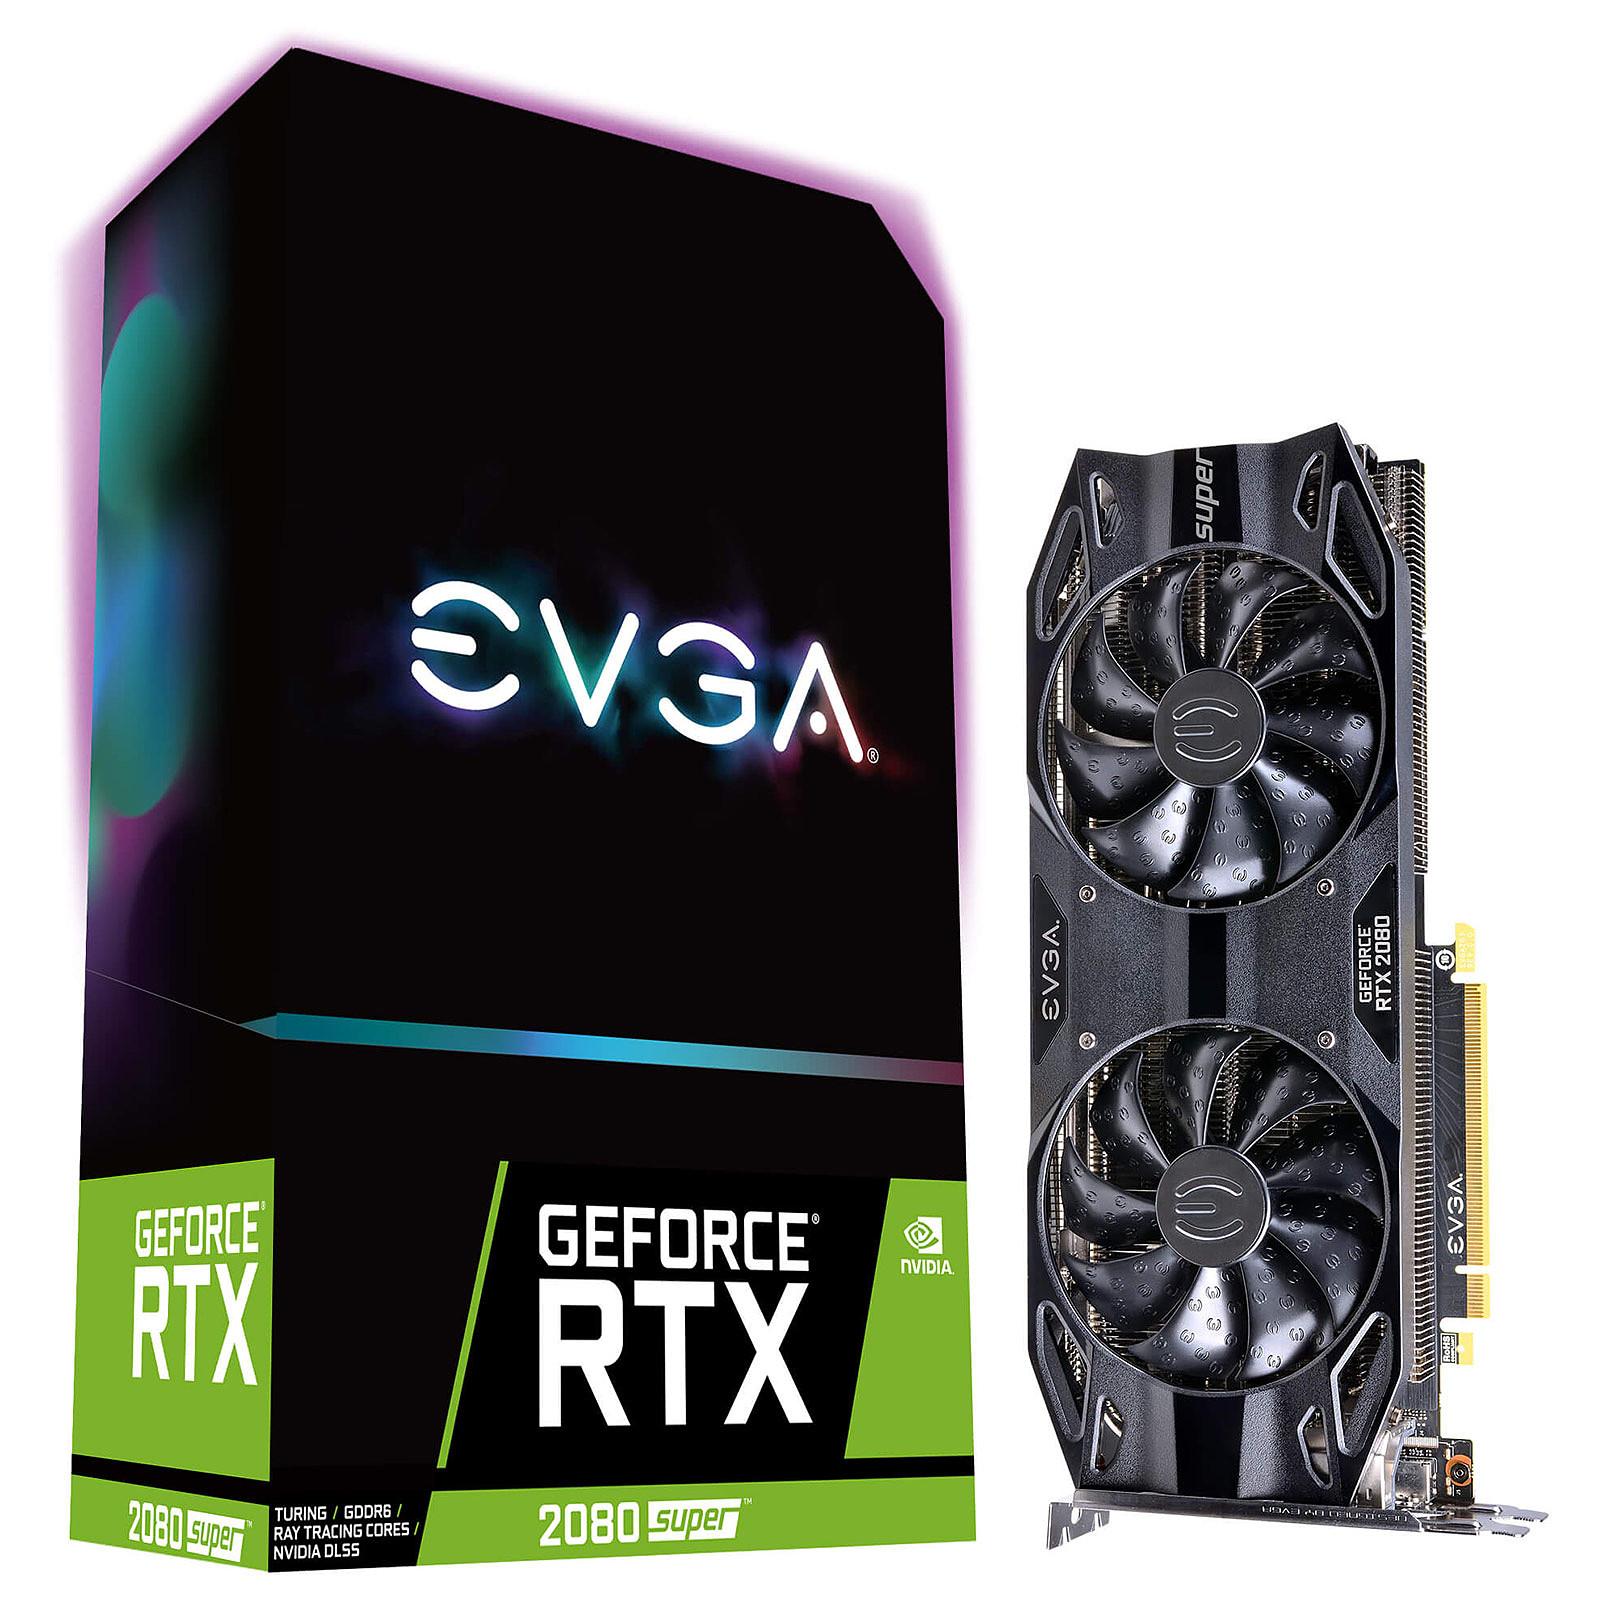 EVGA GeForce RTX 2080 SUPER BLACK GAMING